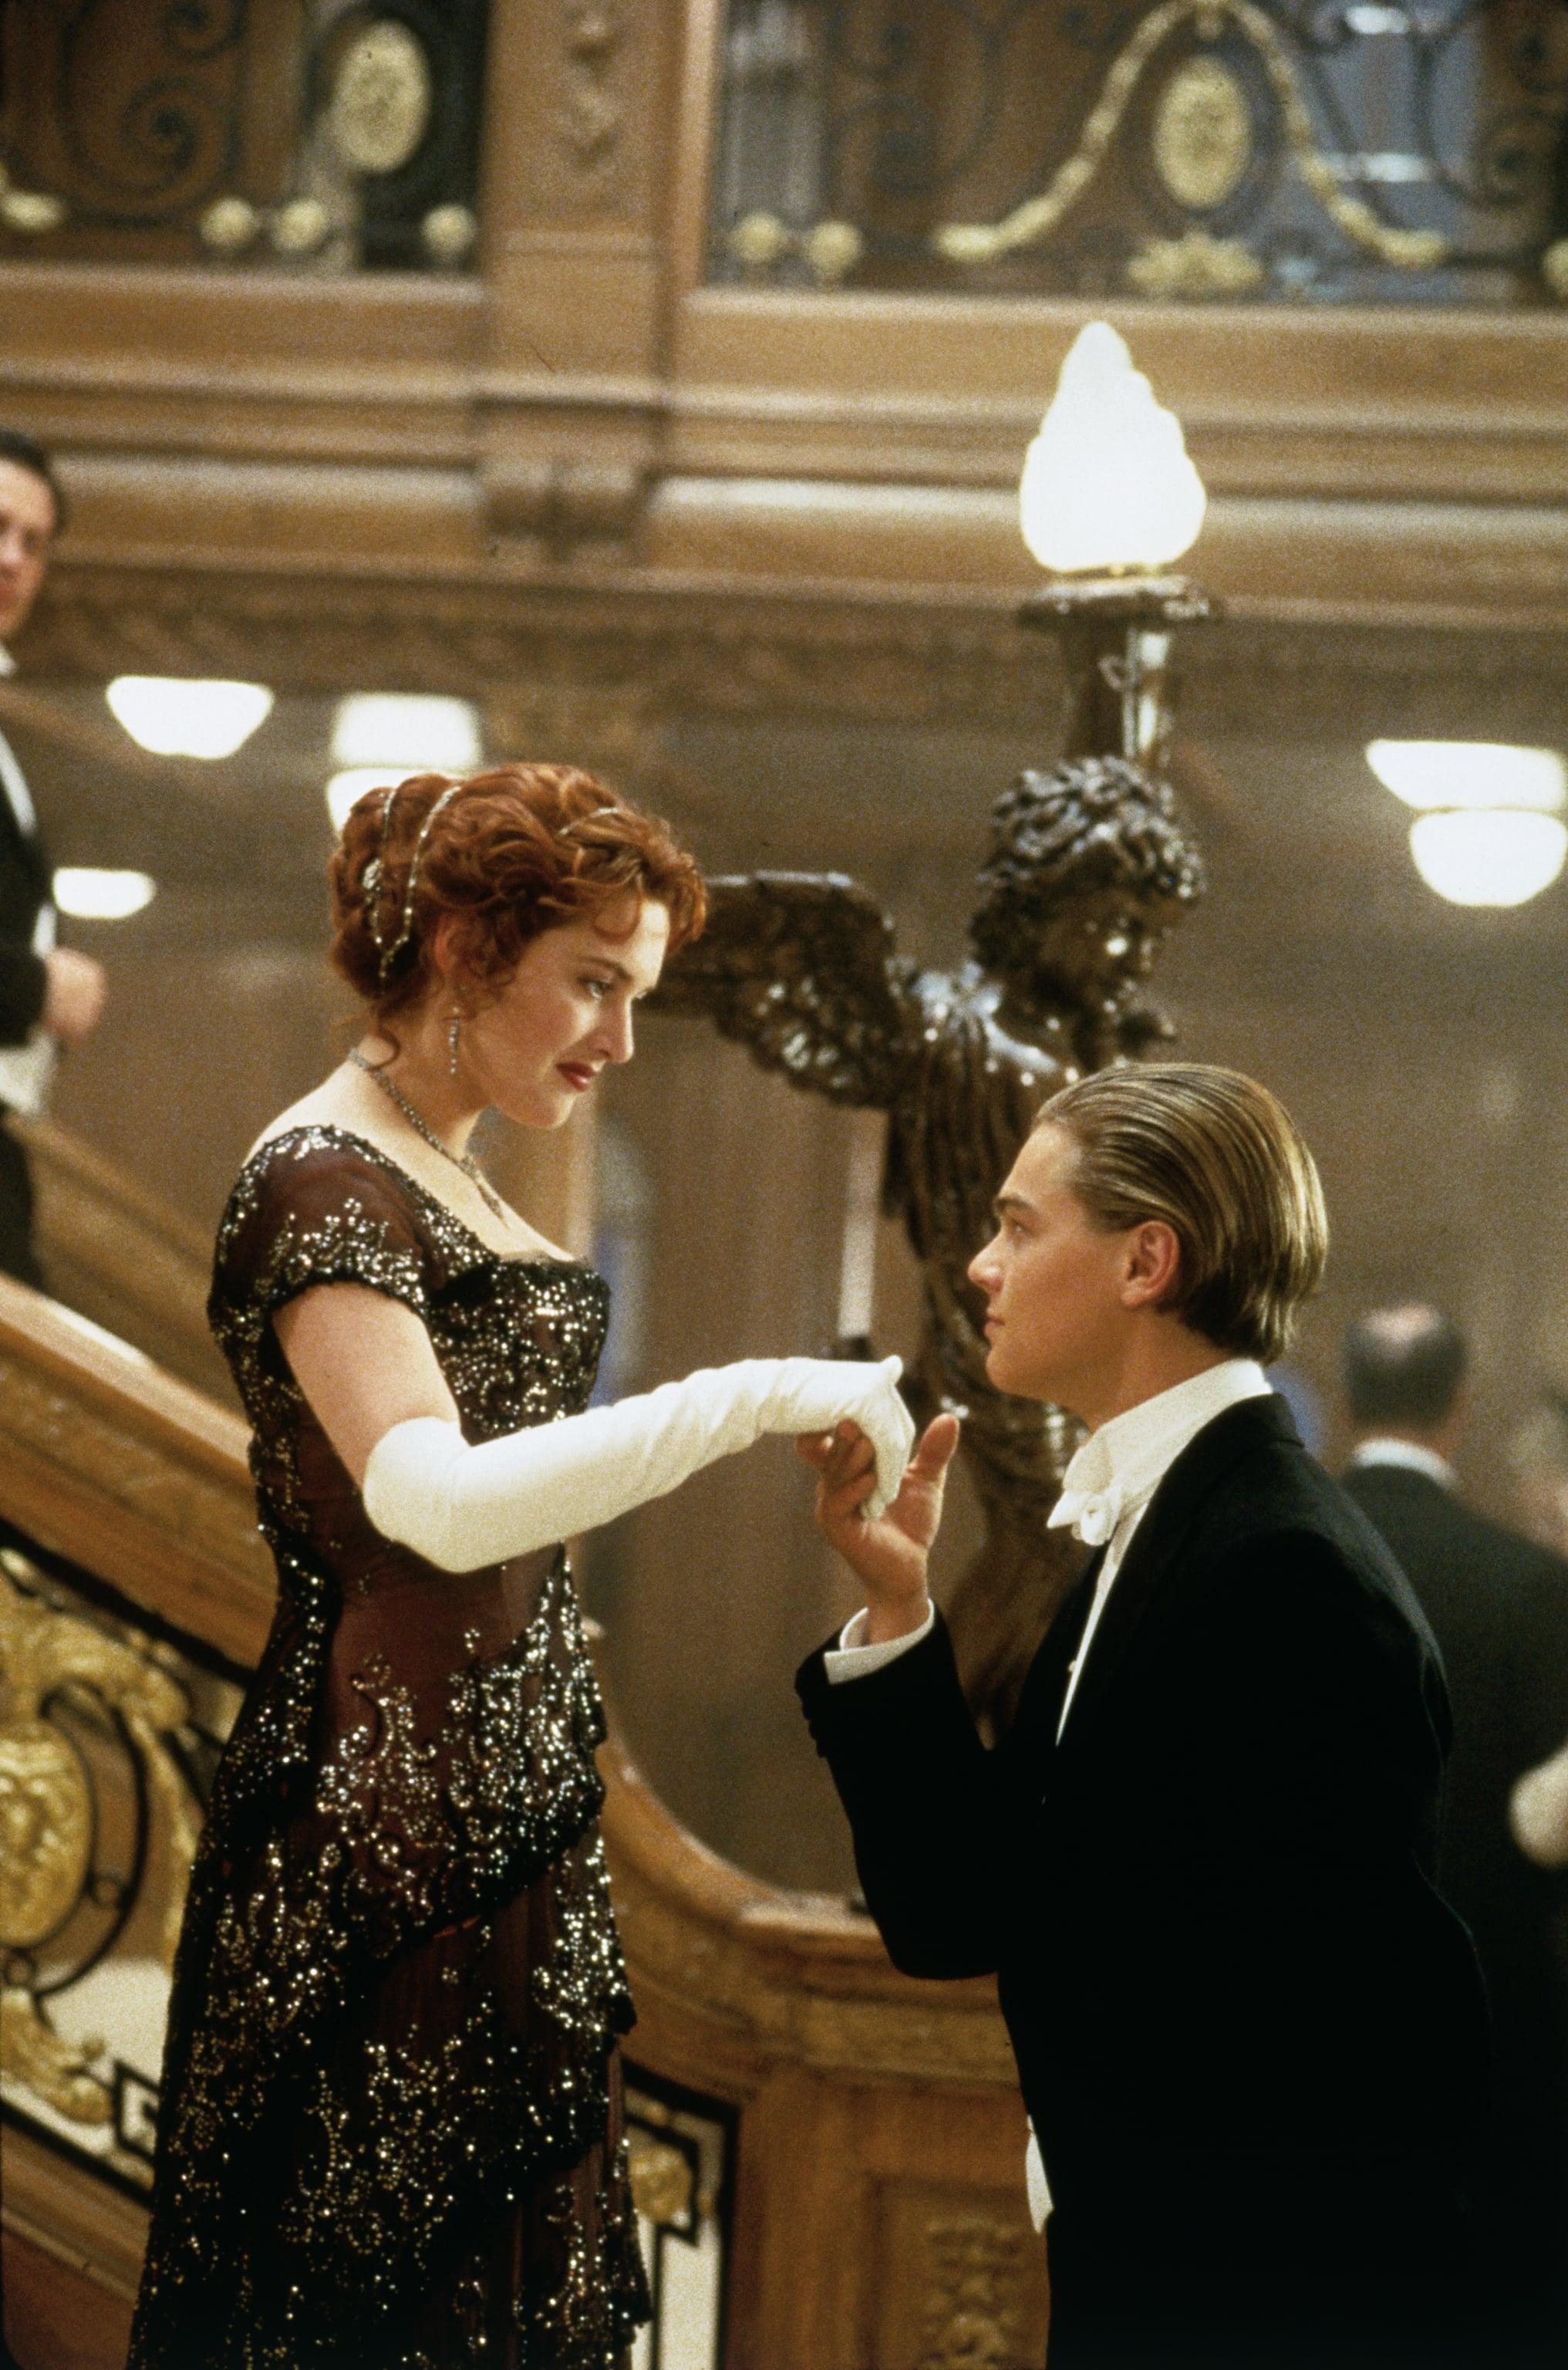 Kate Winslet and Leonardo DiCaprio in Titanic.